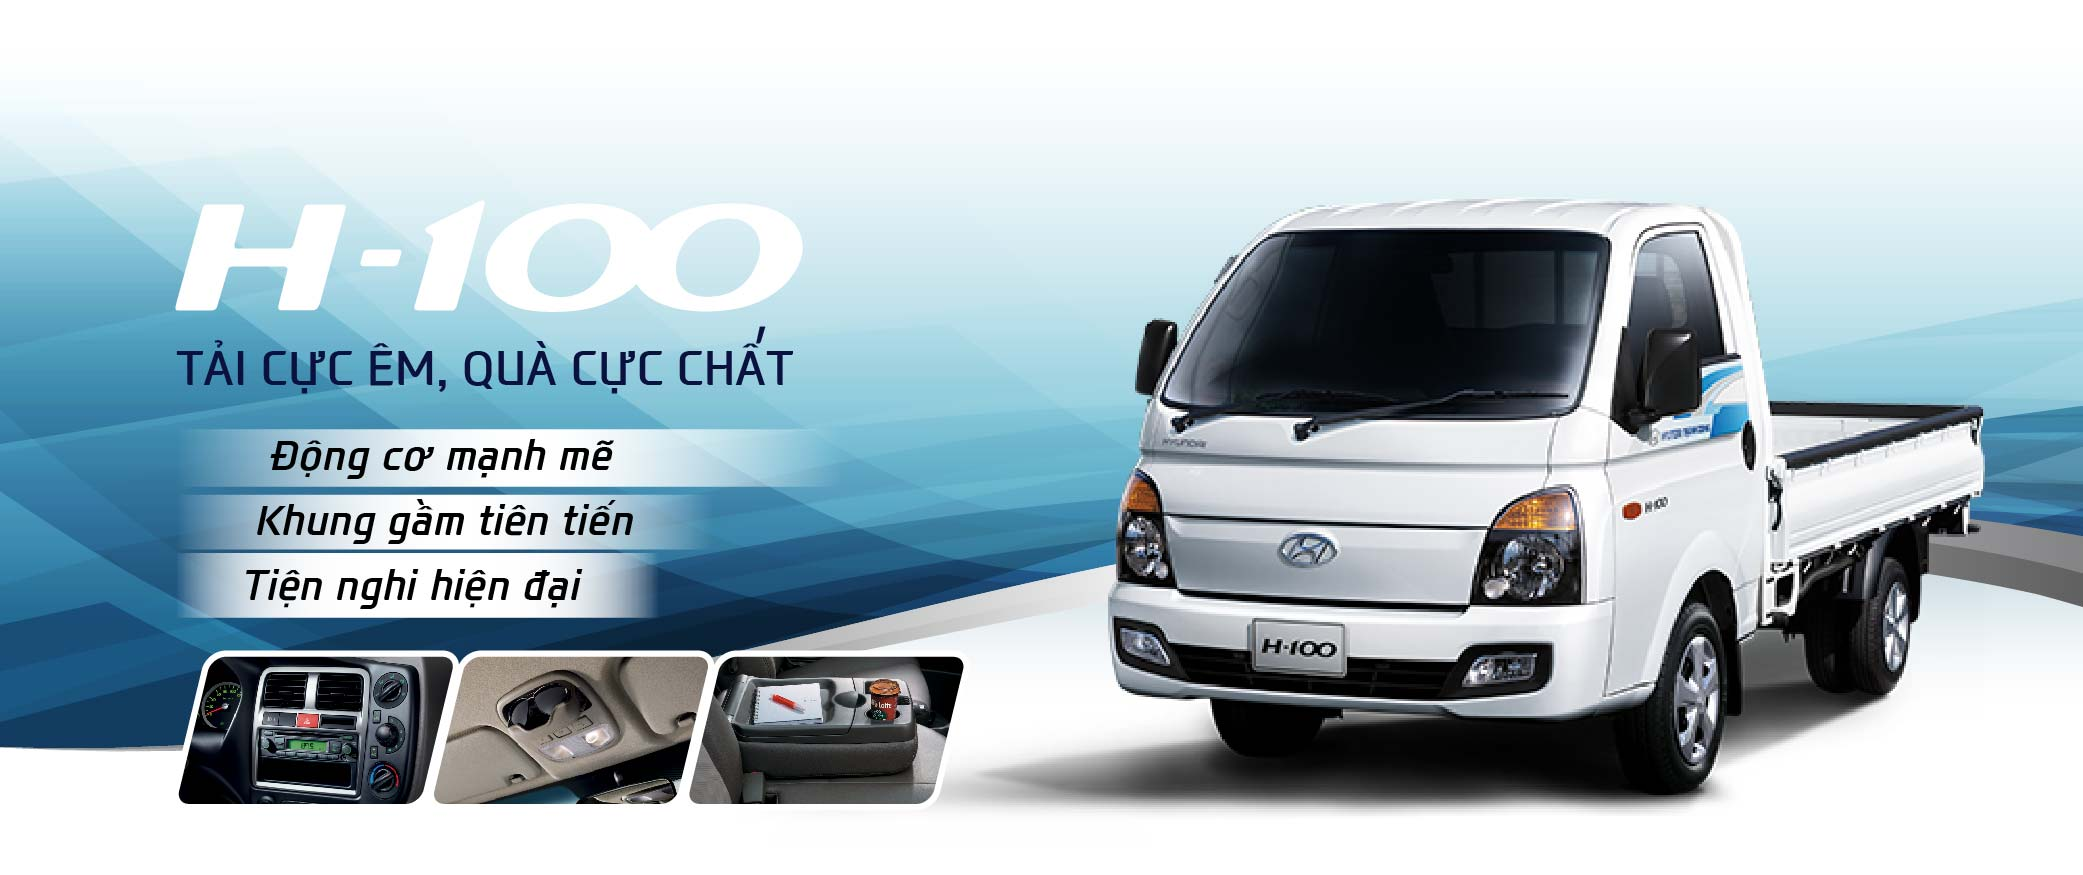 h100-banner-web-01